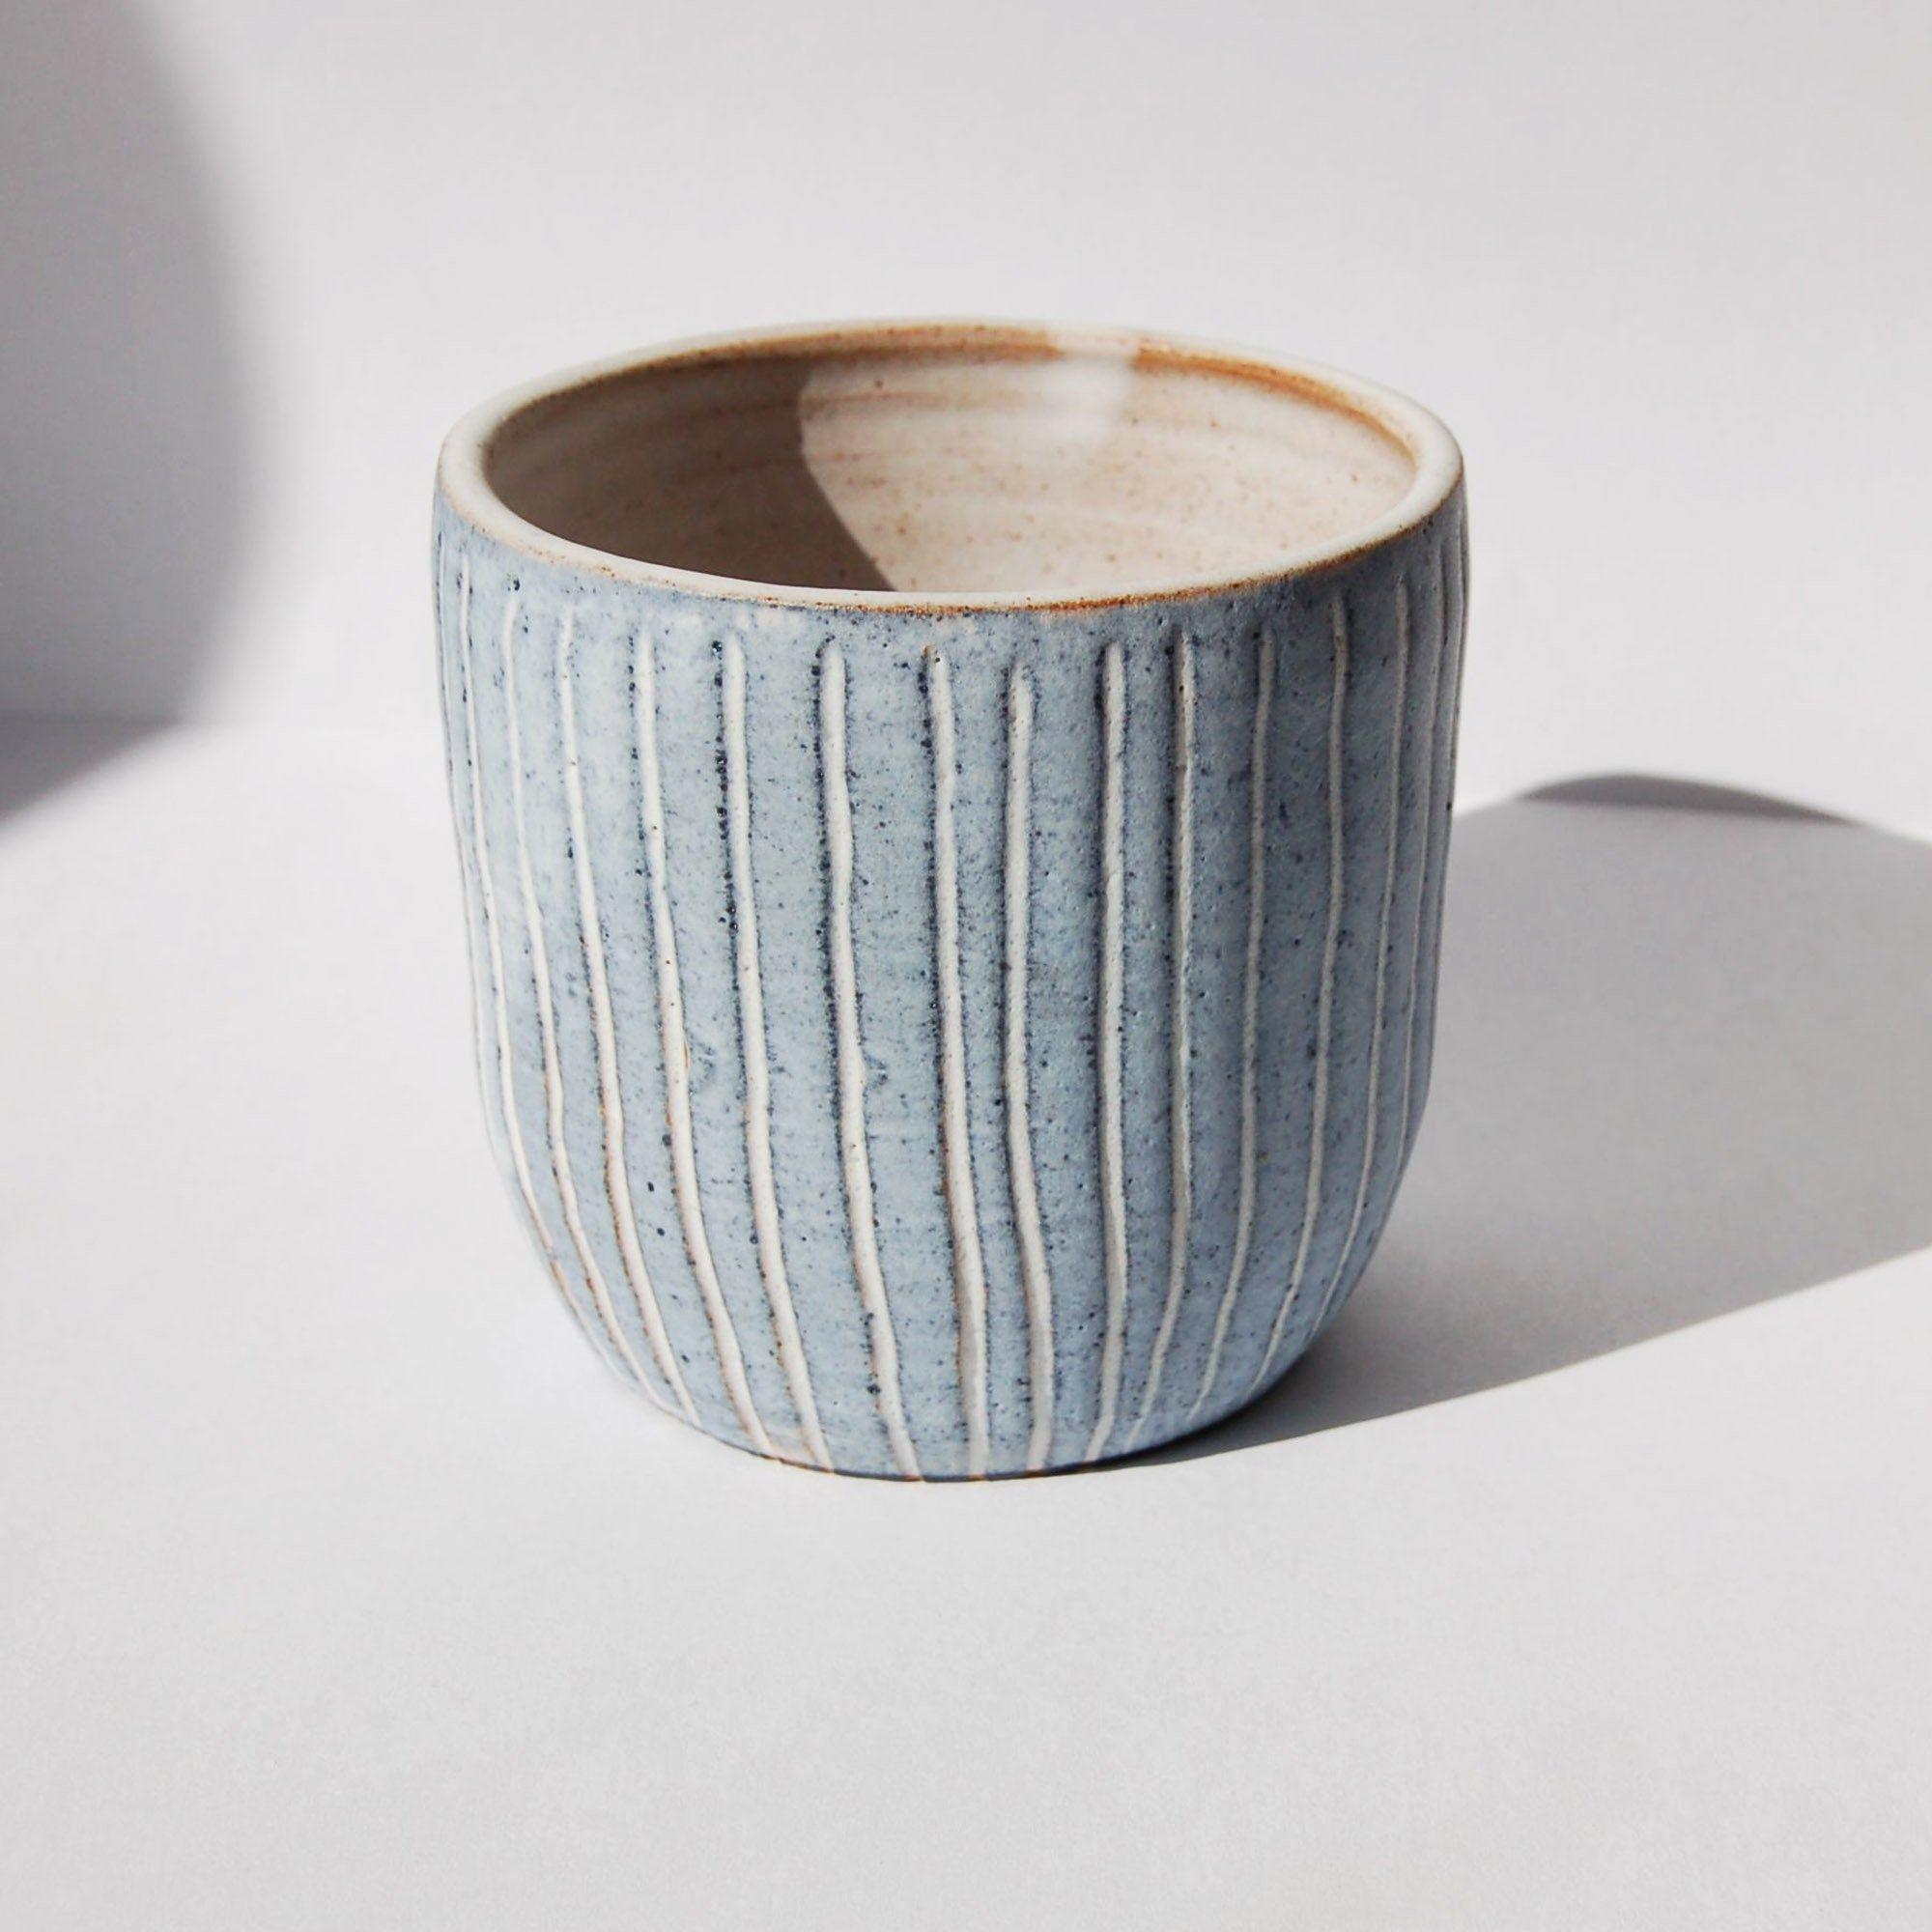 Ceramic Pot With Drainage Hole